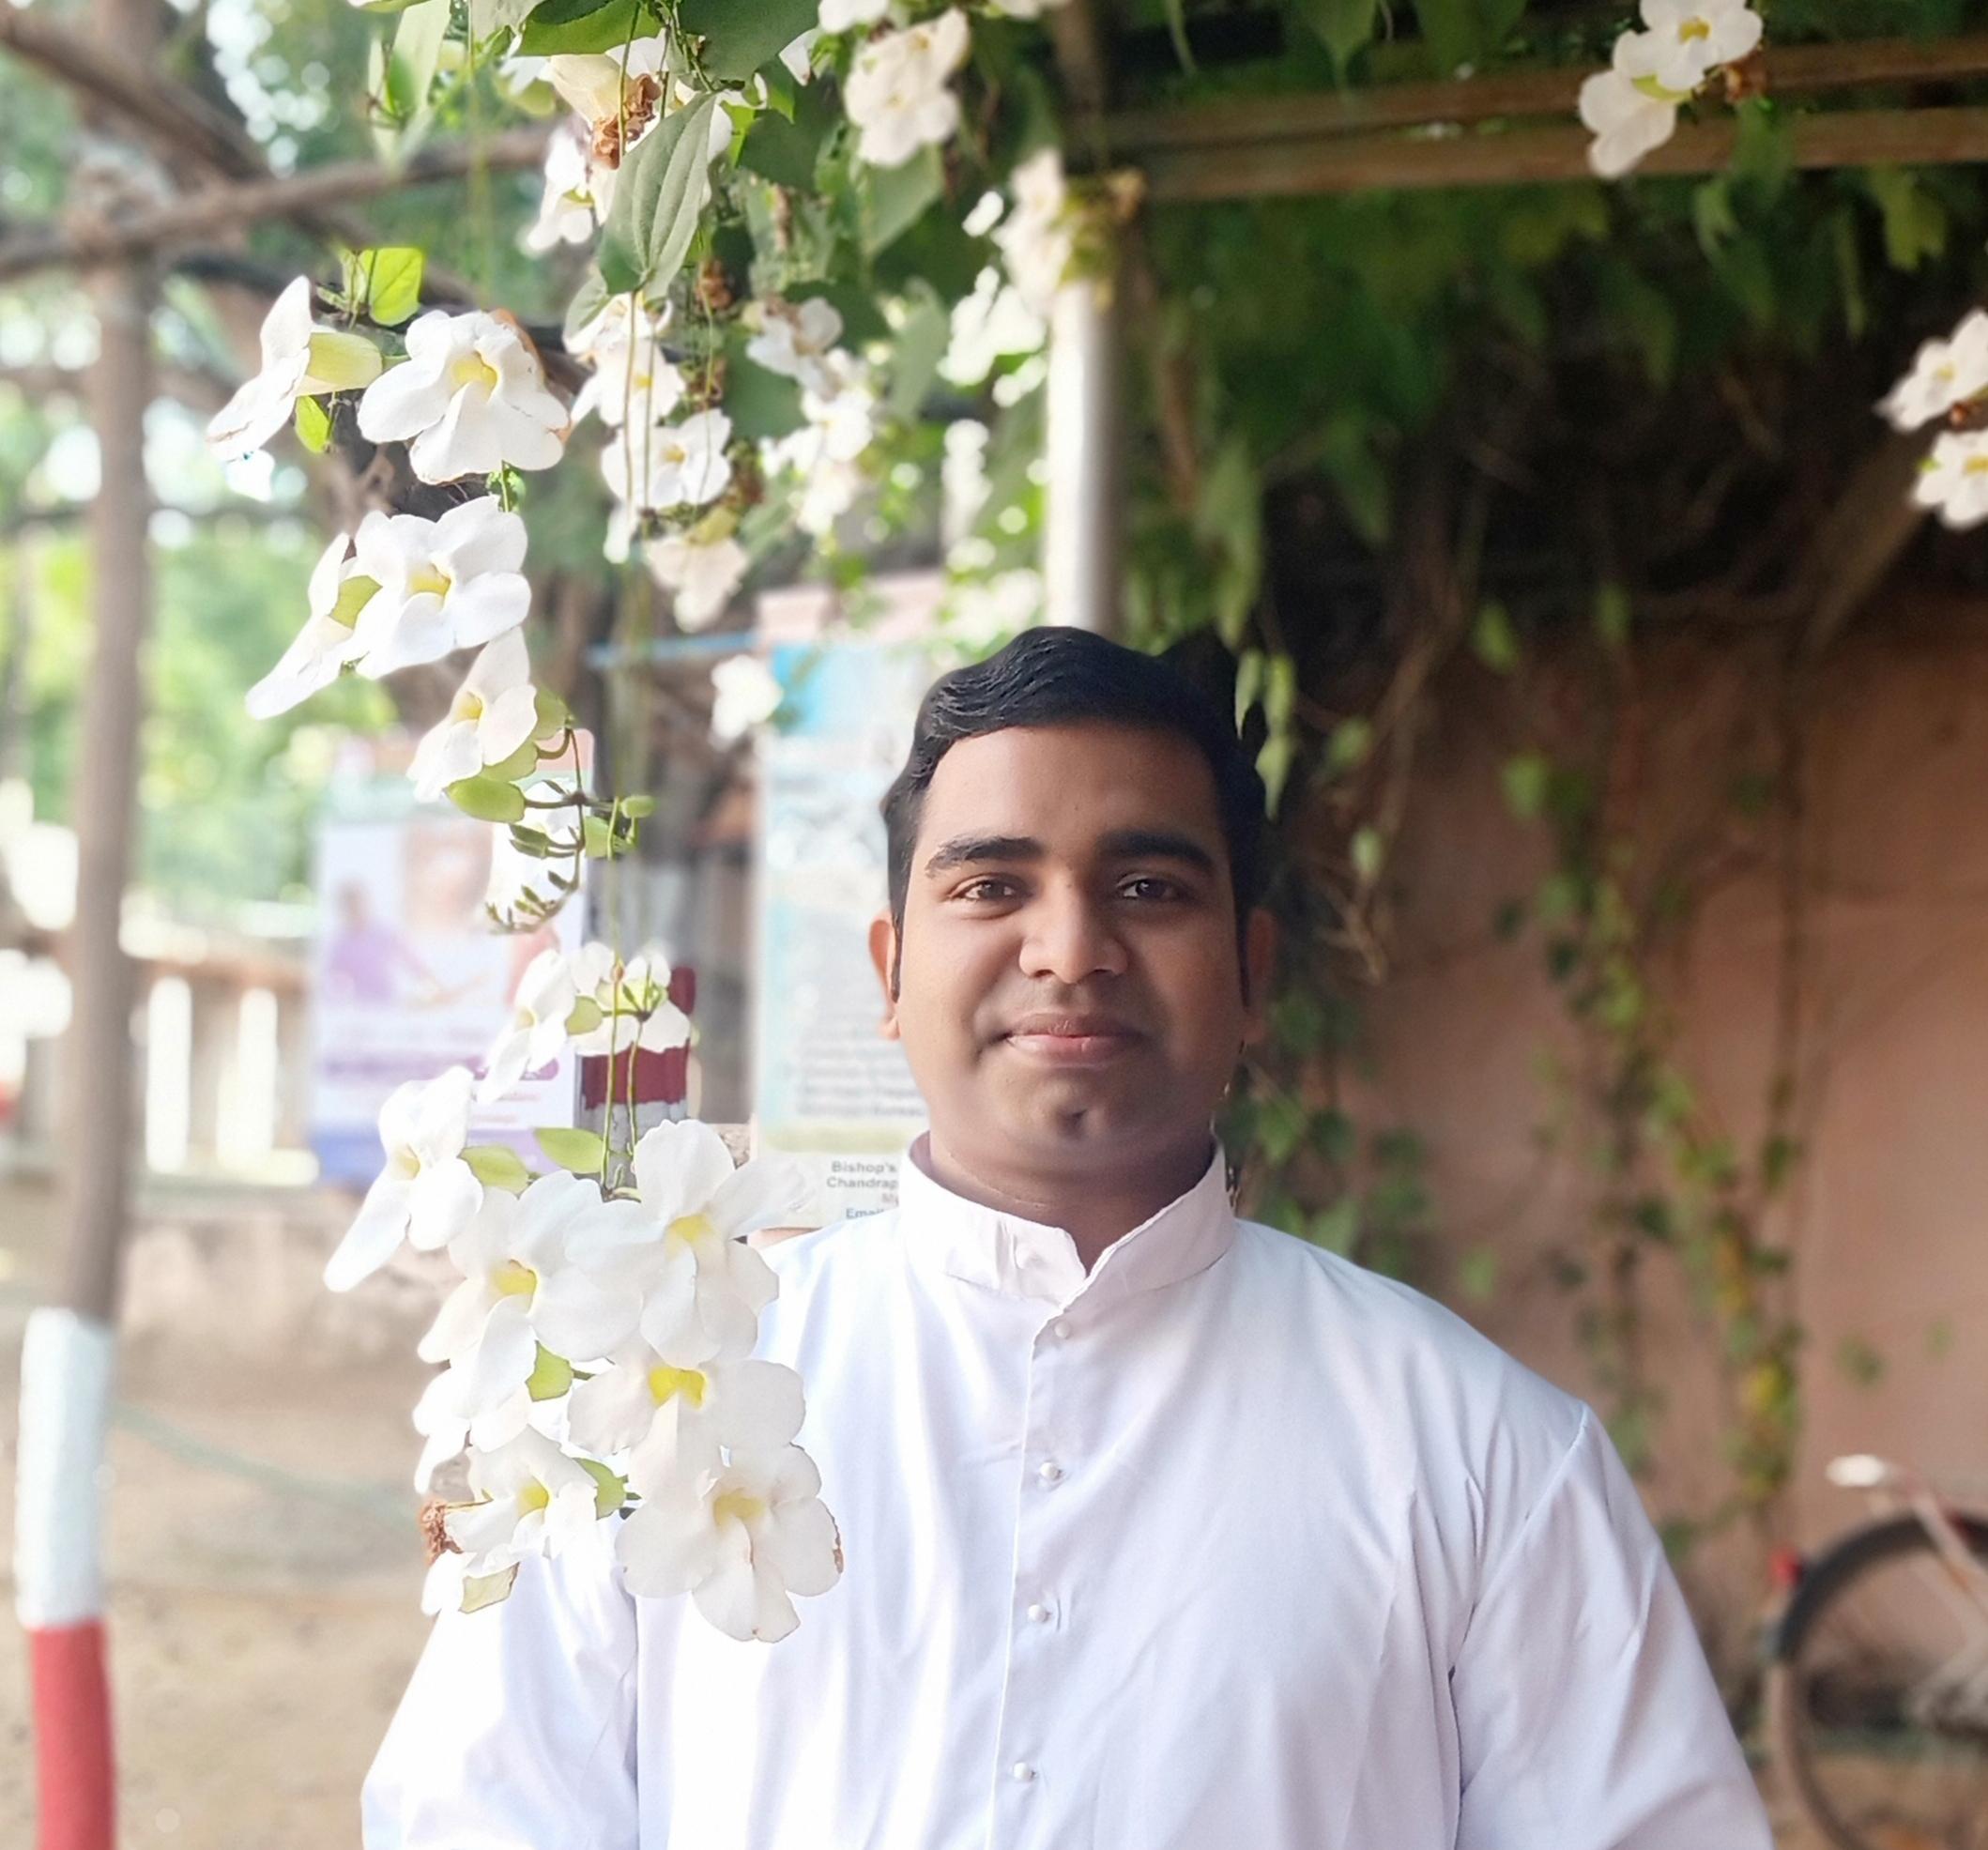 Fr. Nikhil Varghese Chakiath